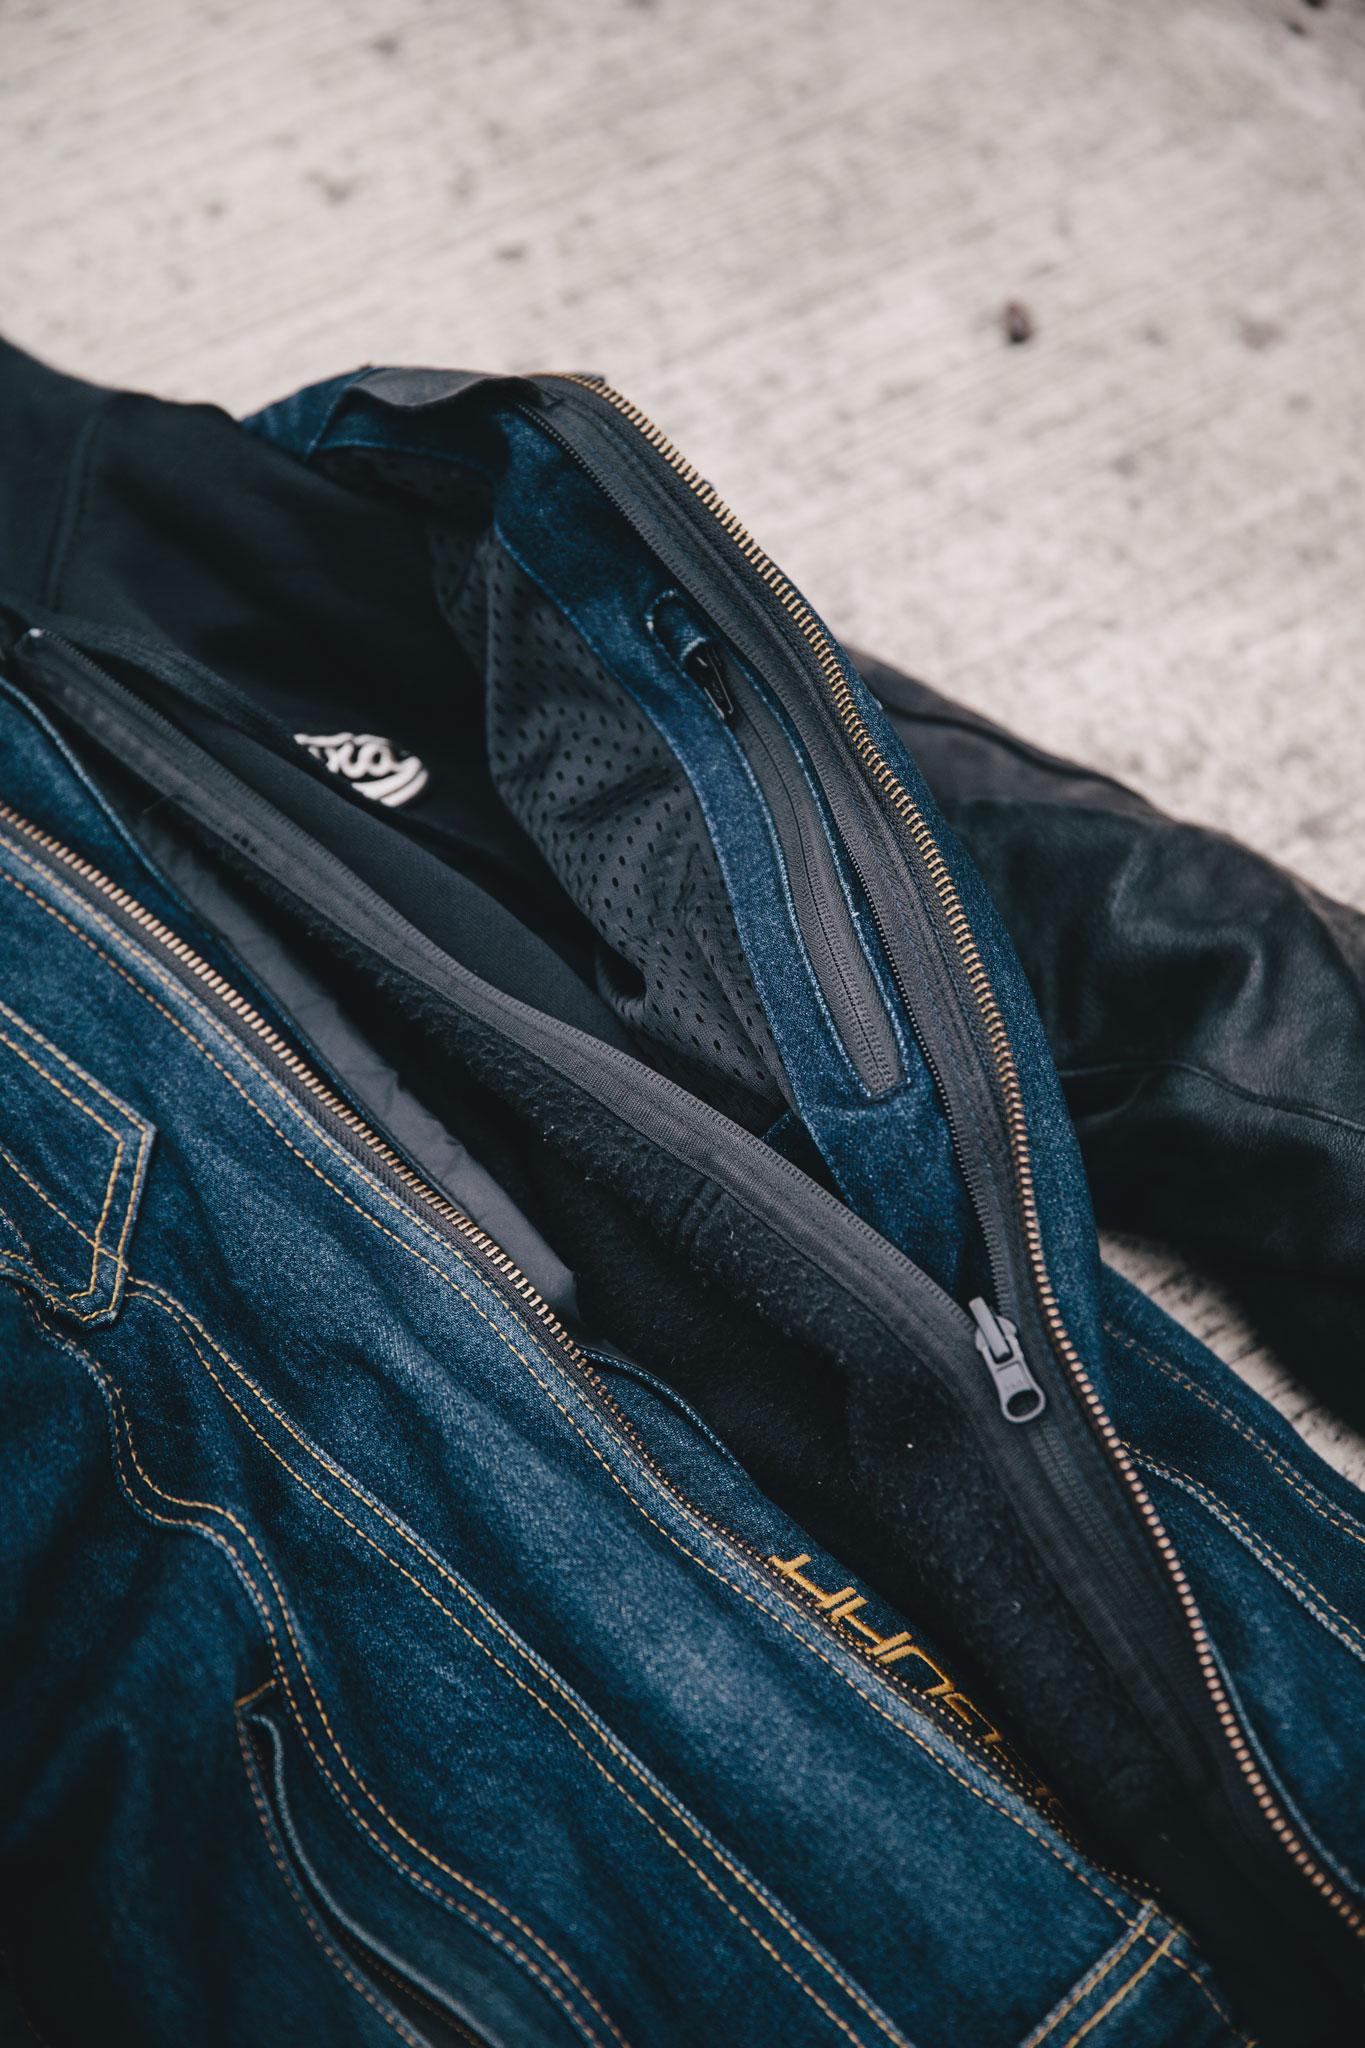 segura_veloce_jacket-17